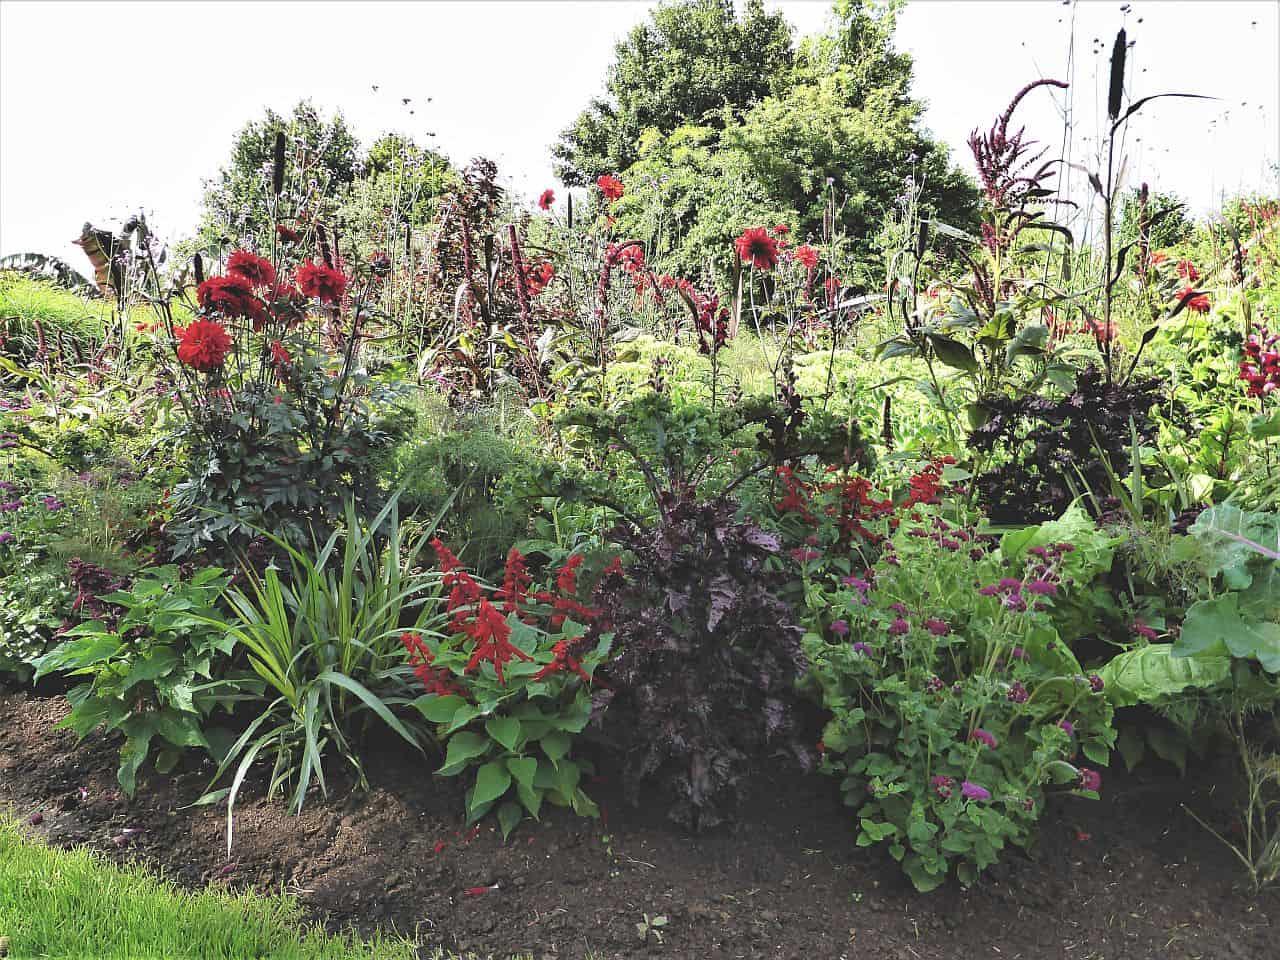 Gartenplanung – Die rote Rabatte